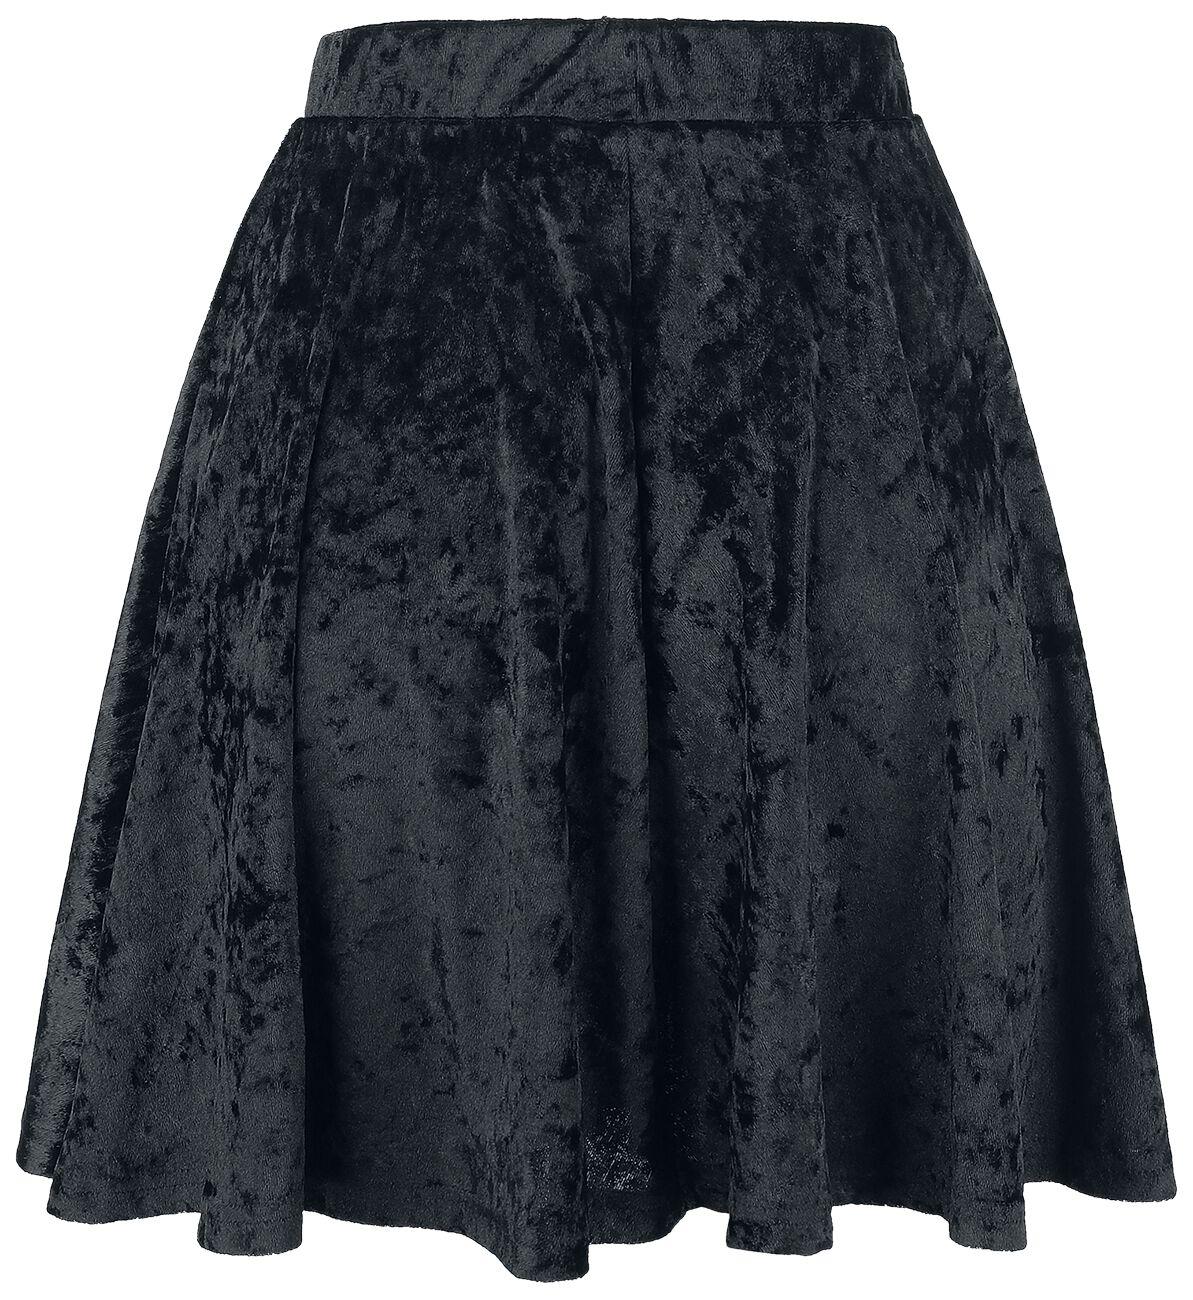 Forplay Velvet Skirt Spódnica czarny